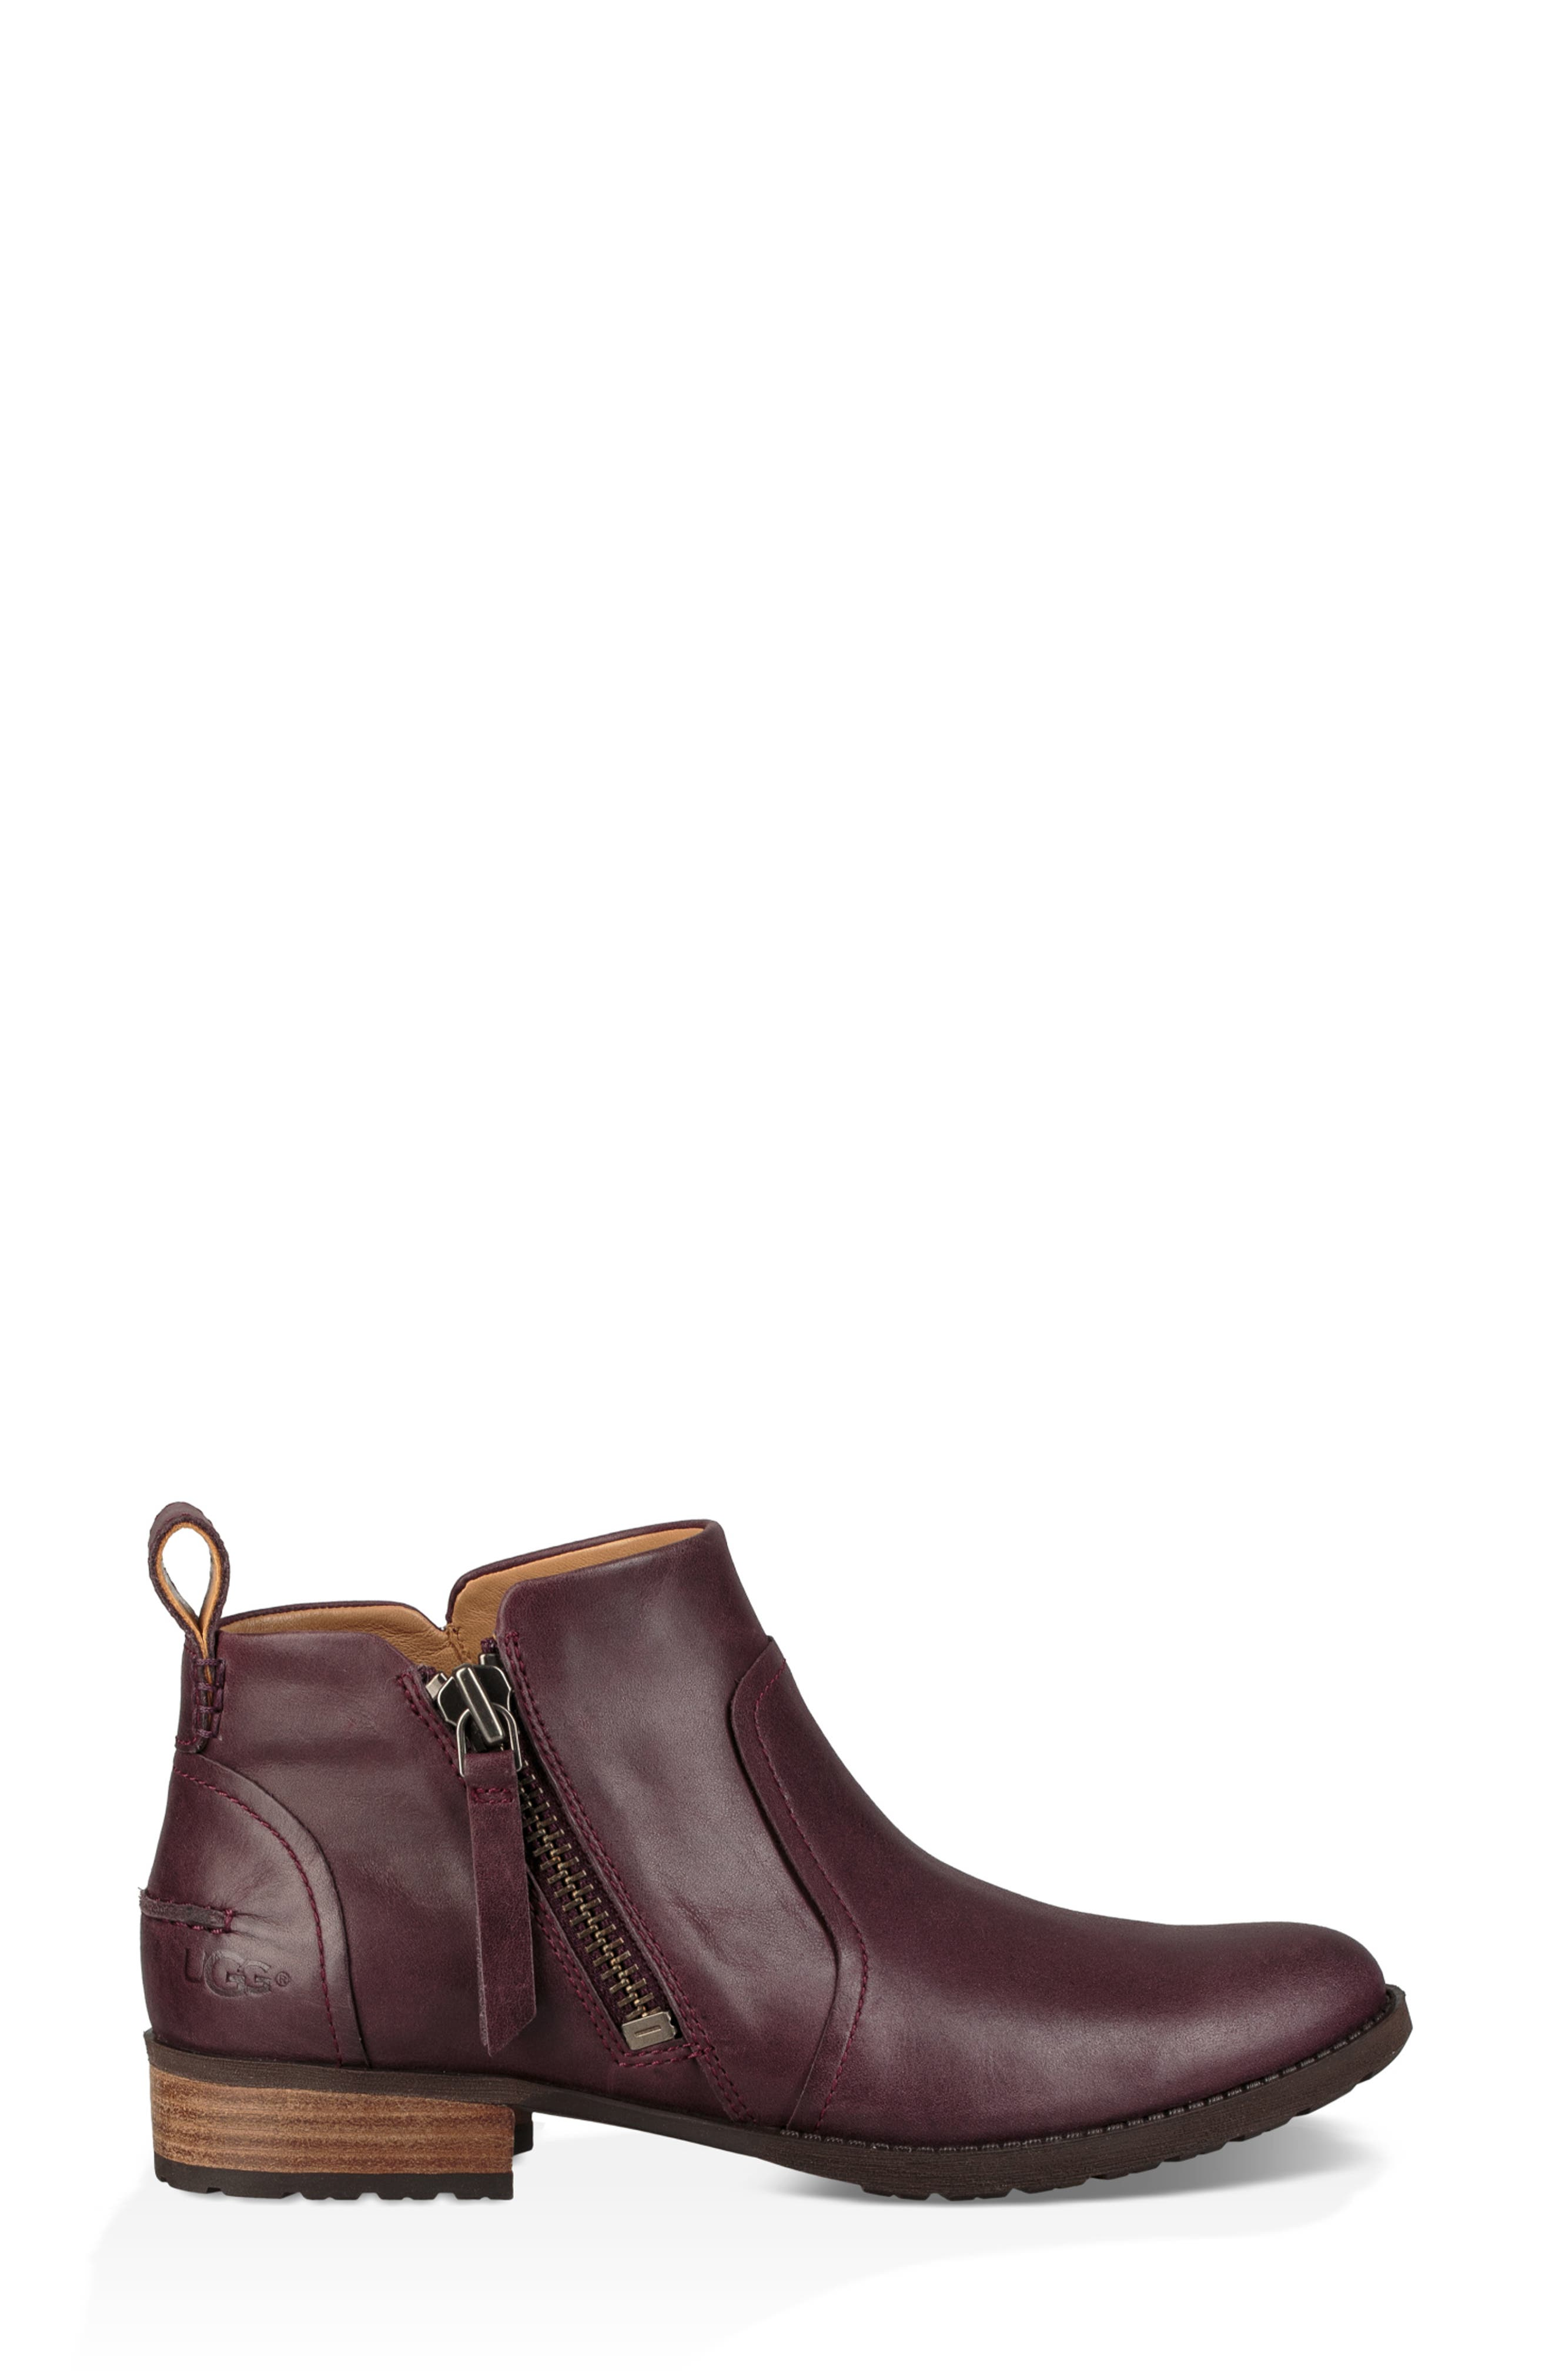 Aureo Bootie,                             Alternate thumbnail 5, color,                             Oxblood Leather